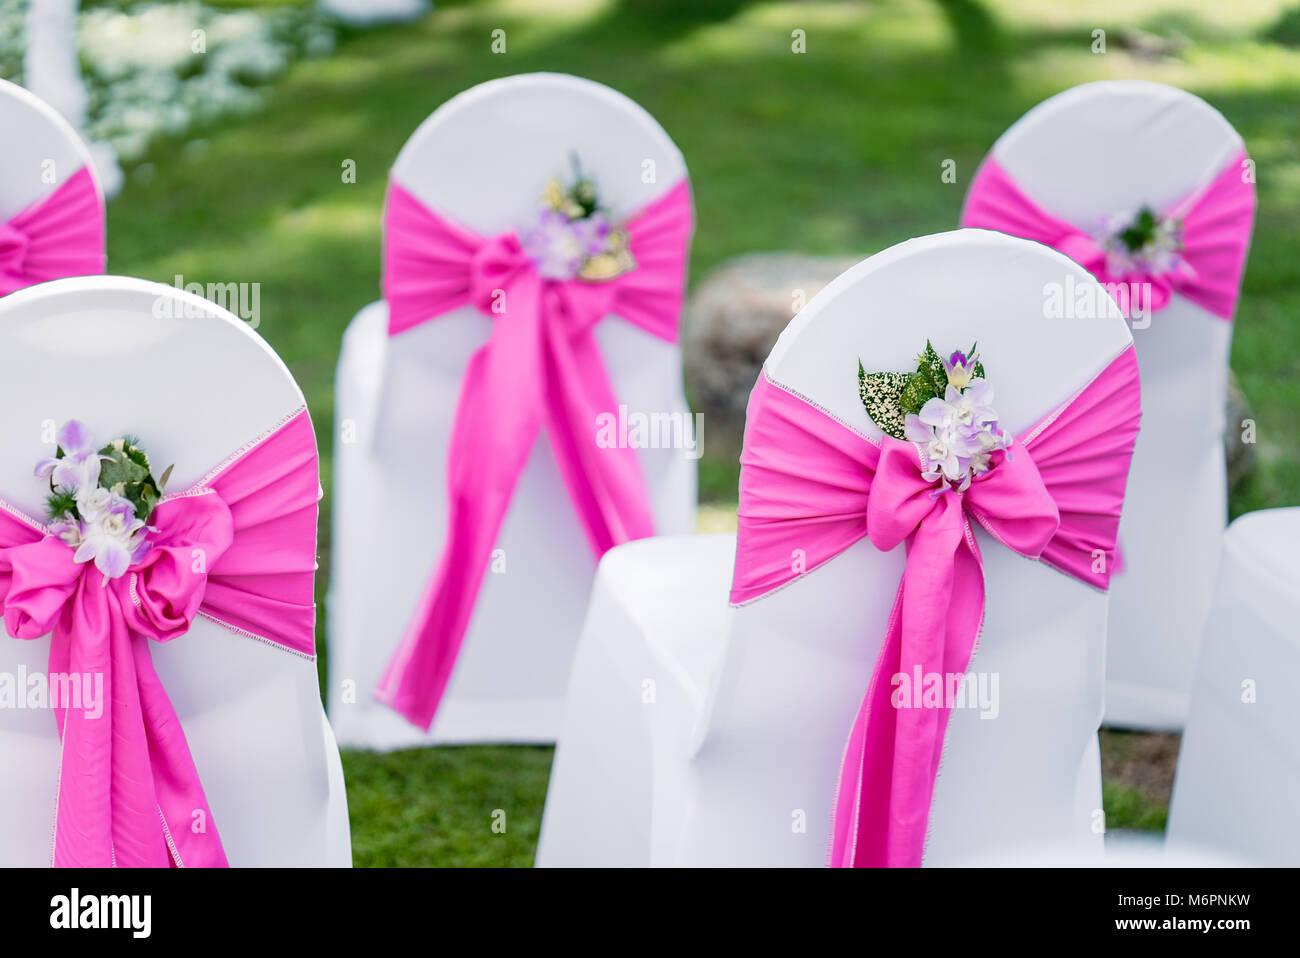 Wedding Seat Stock Photos & Wedding Seat Stock Images - Alamy